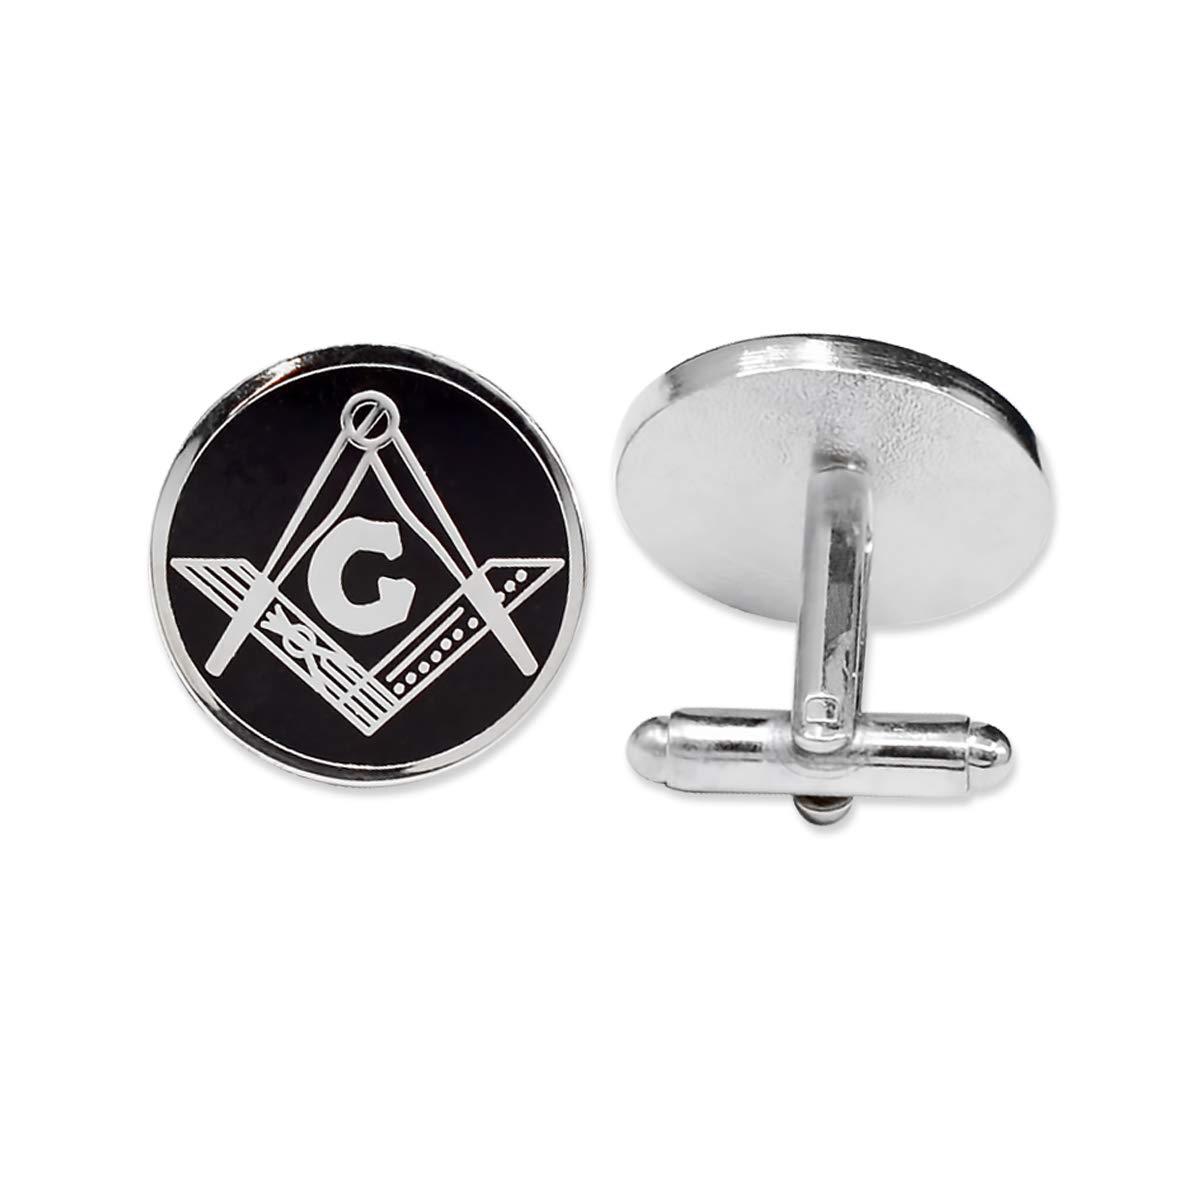 Square & Compass Round Silver & Black Masonic Cufflink Set - 3/4'' Diameter